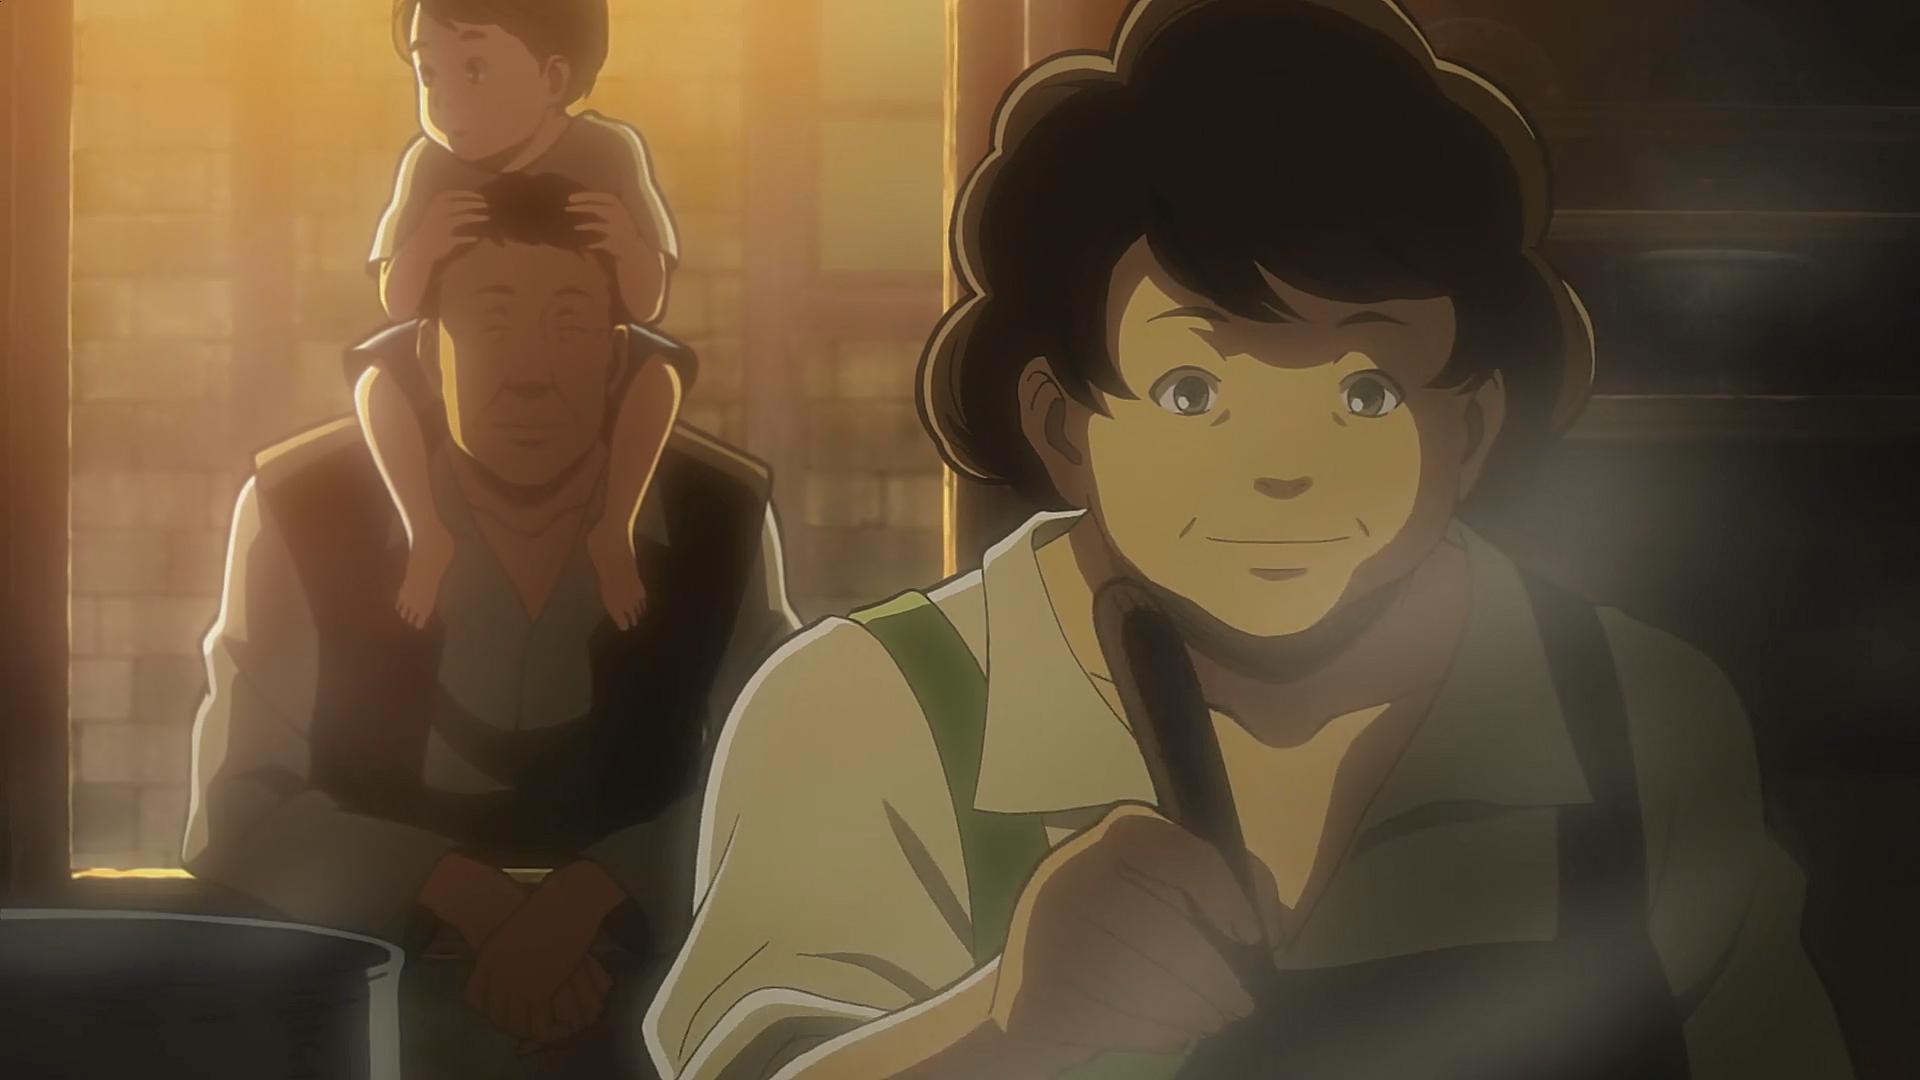 Bozad Family Anime Attack On Titan Wiki Fandom